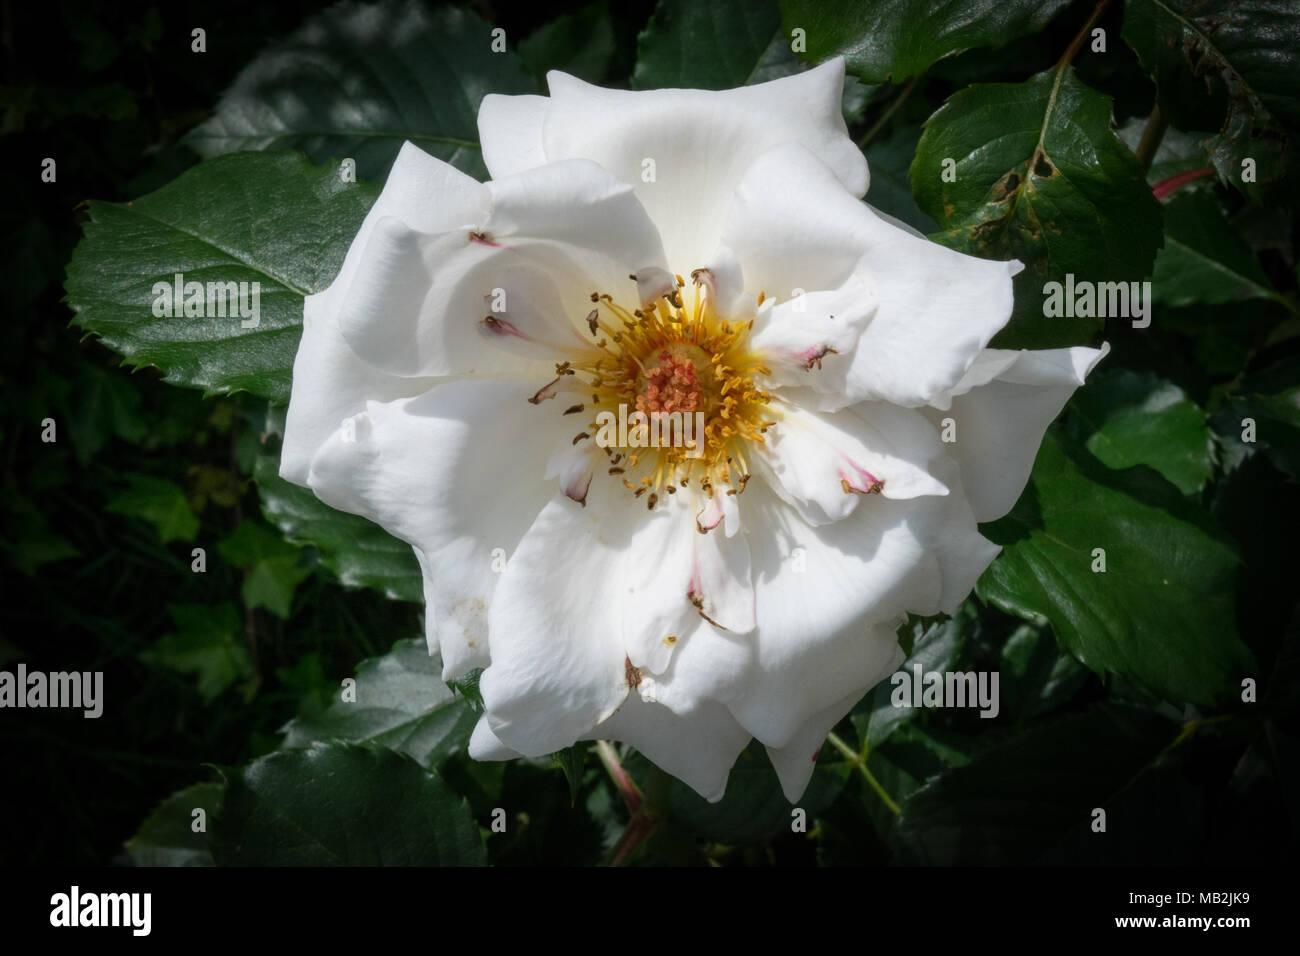 Margaret merril beautiful white rose flowers in and english country margaret merril beautiful white rose flowers in and english country garden izmirmasajfo